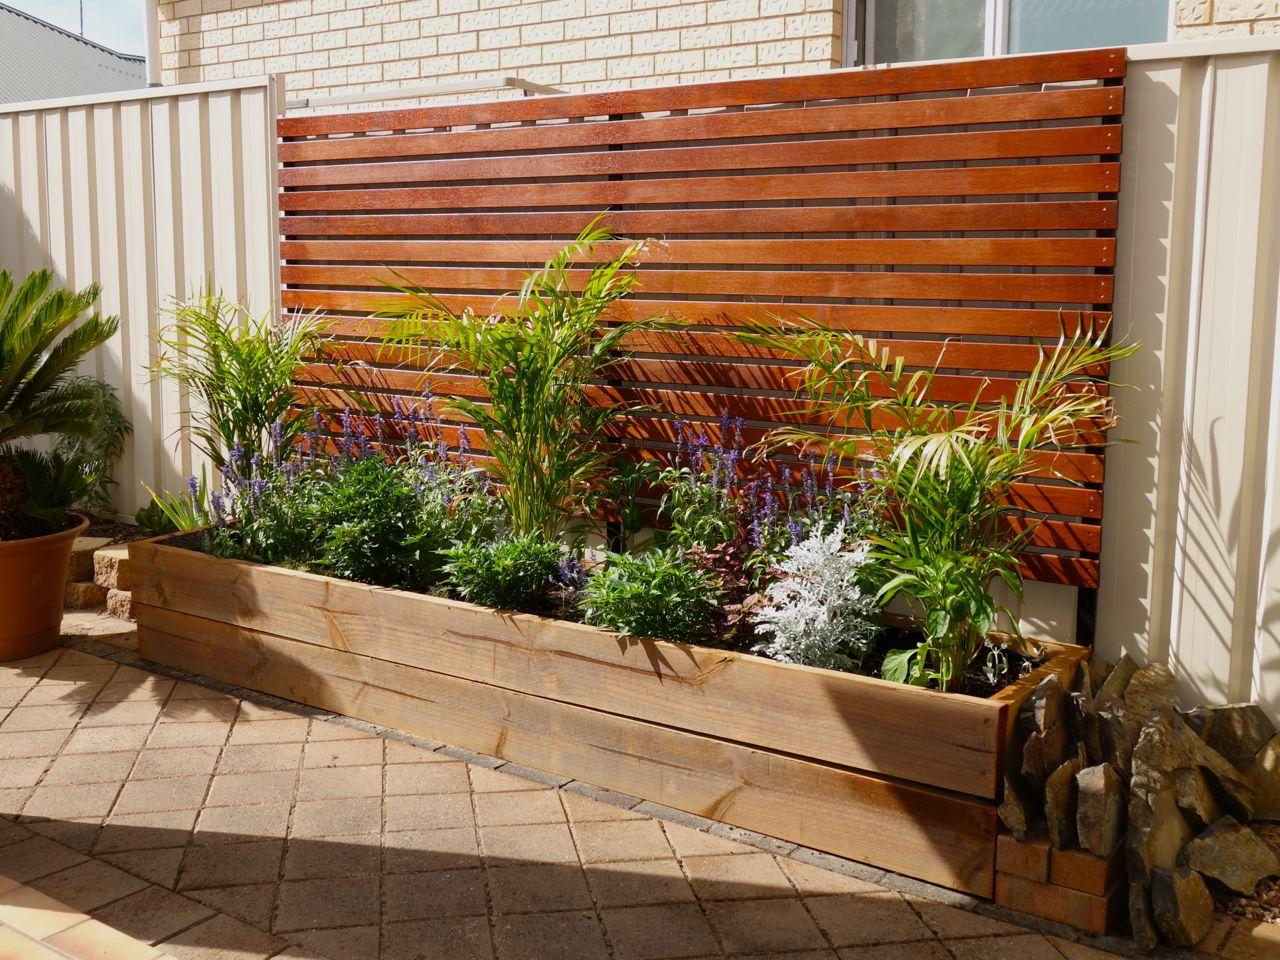 Adelaide Lawn And Garden Specialist   Albert Street, Prospect, South Australia 5082   +61 434 748 030